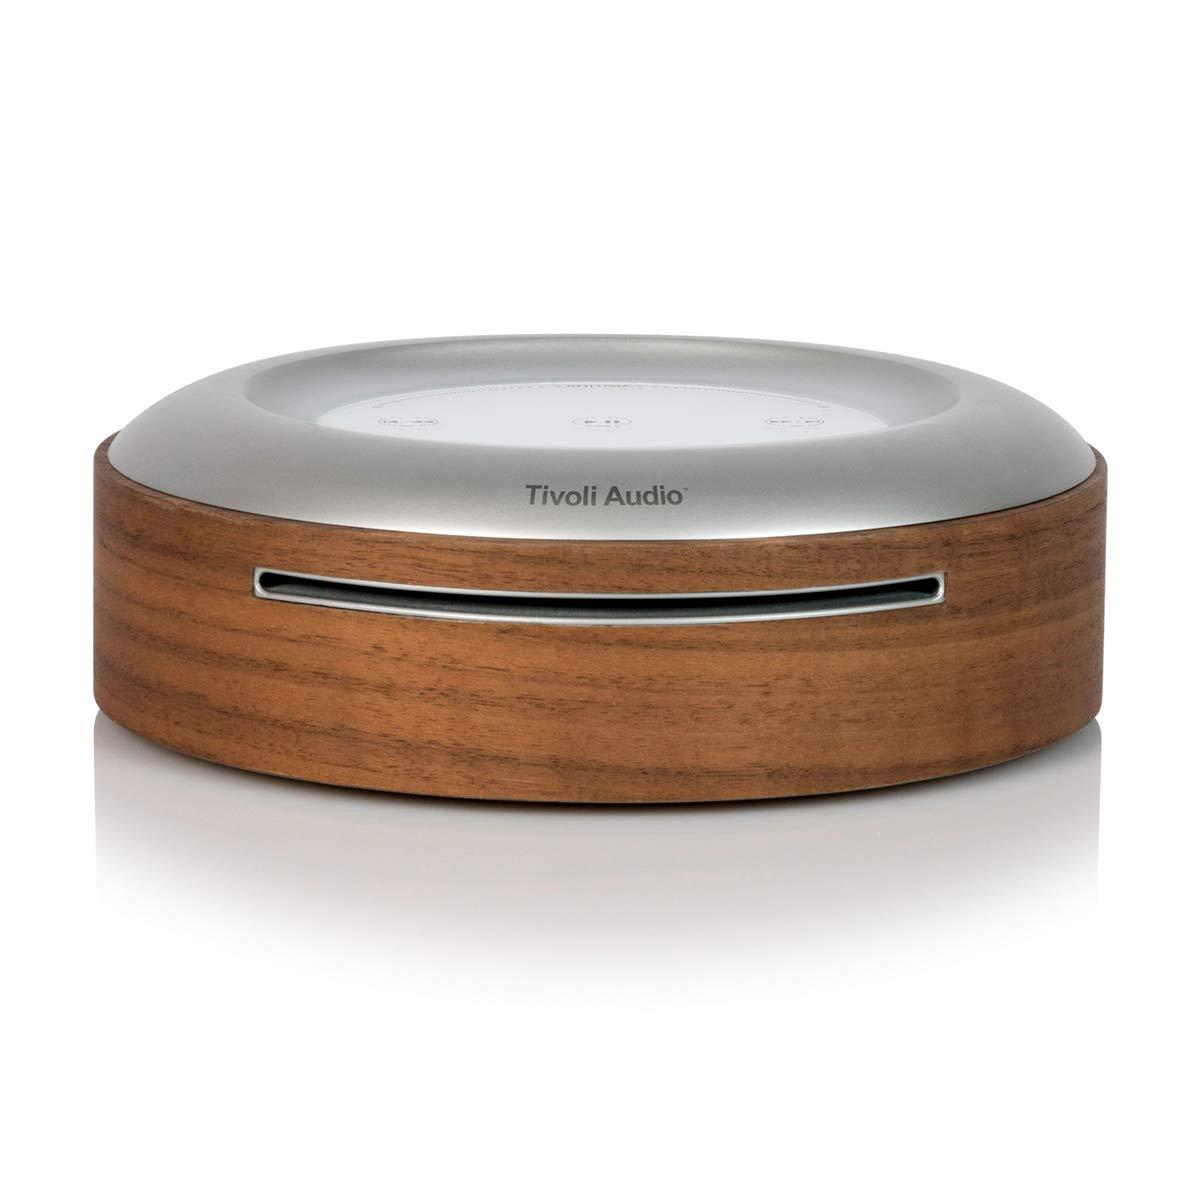 Tivoli Audio Wireless Home Model CD Player Walnut (ARTCD-1785-NA)